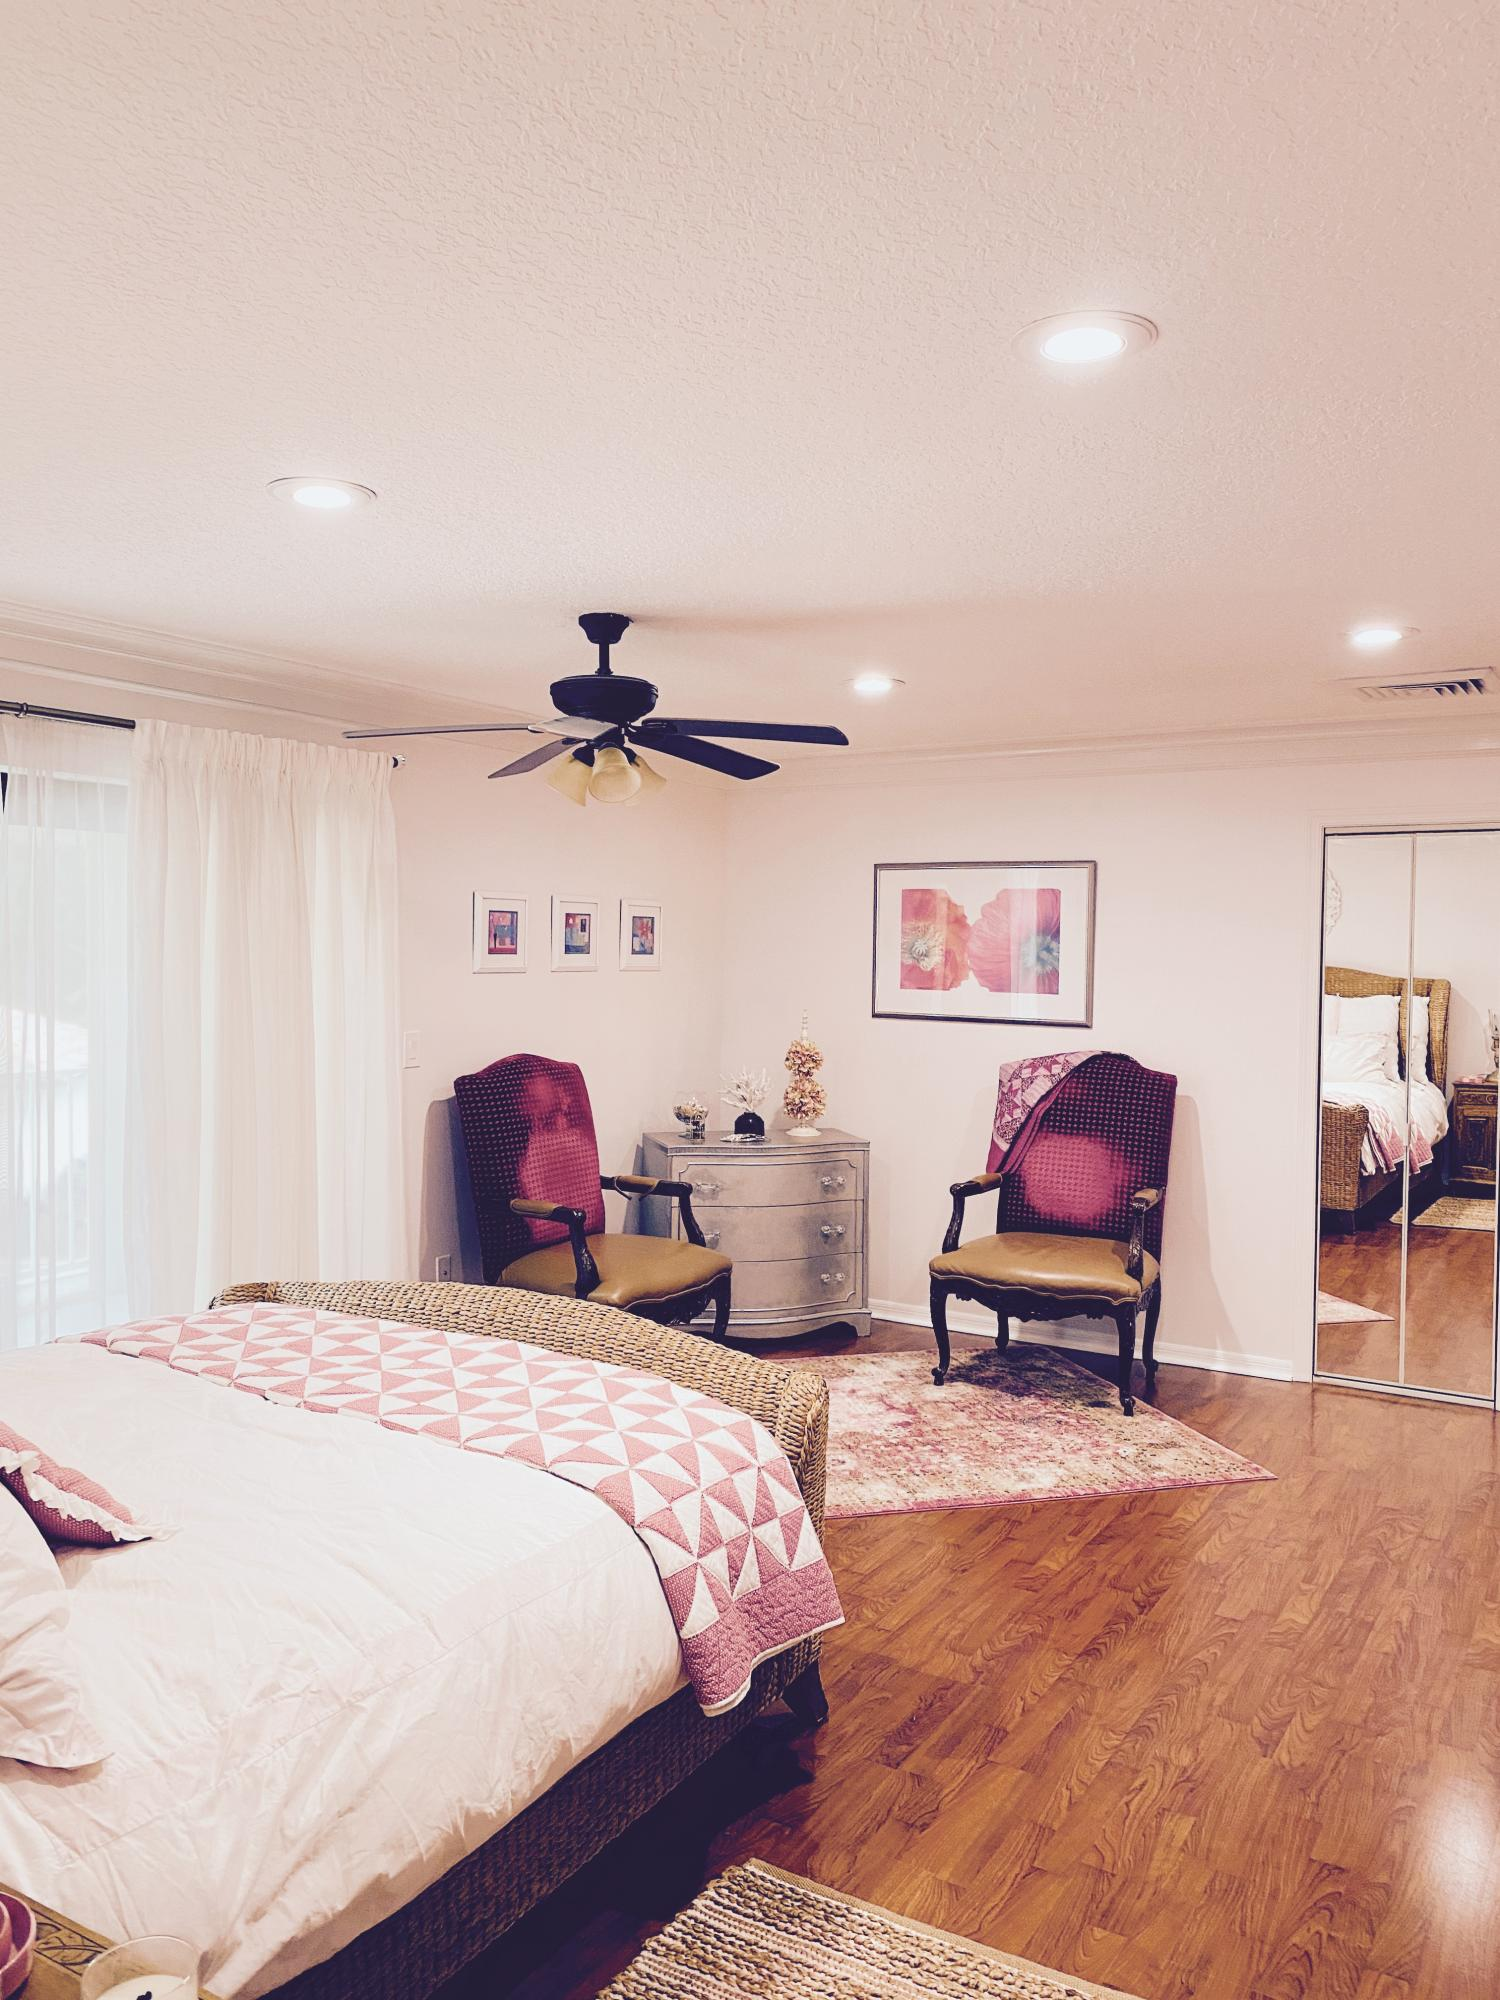 BEDROOM#4 WITH 2 WALKIN CLOSETS